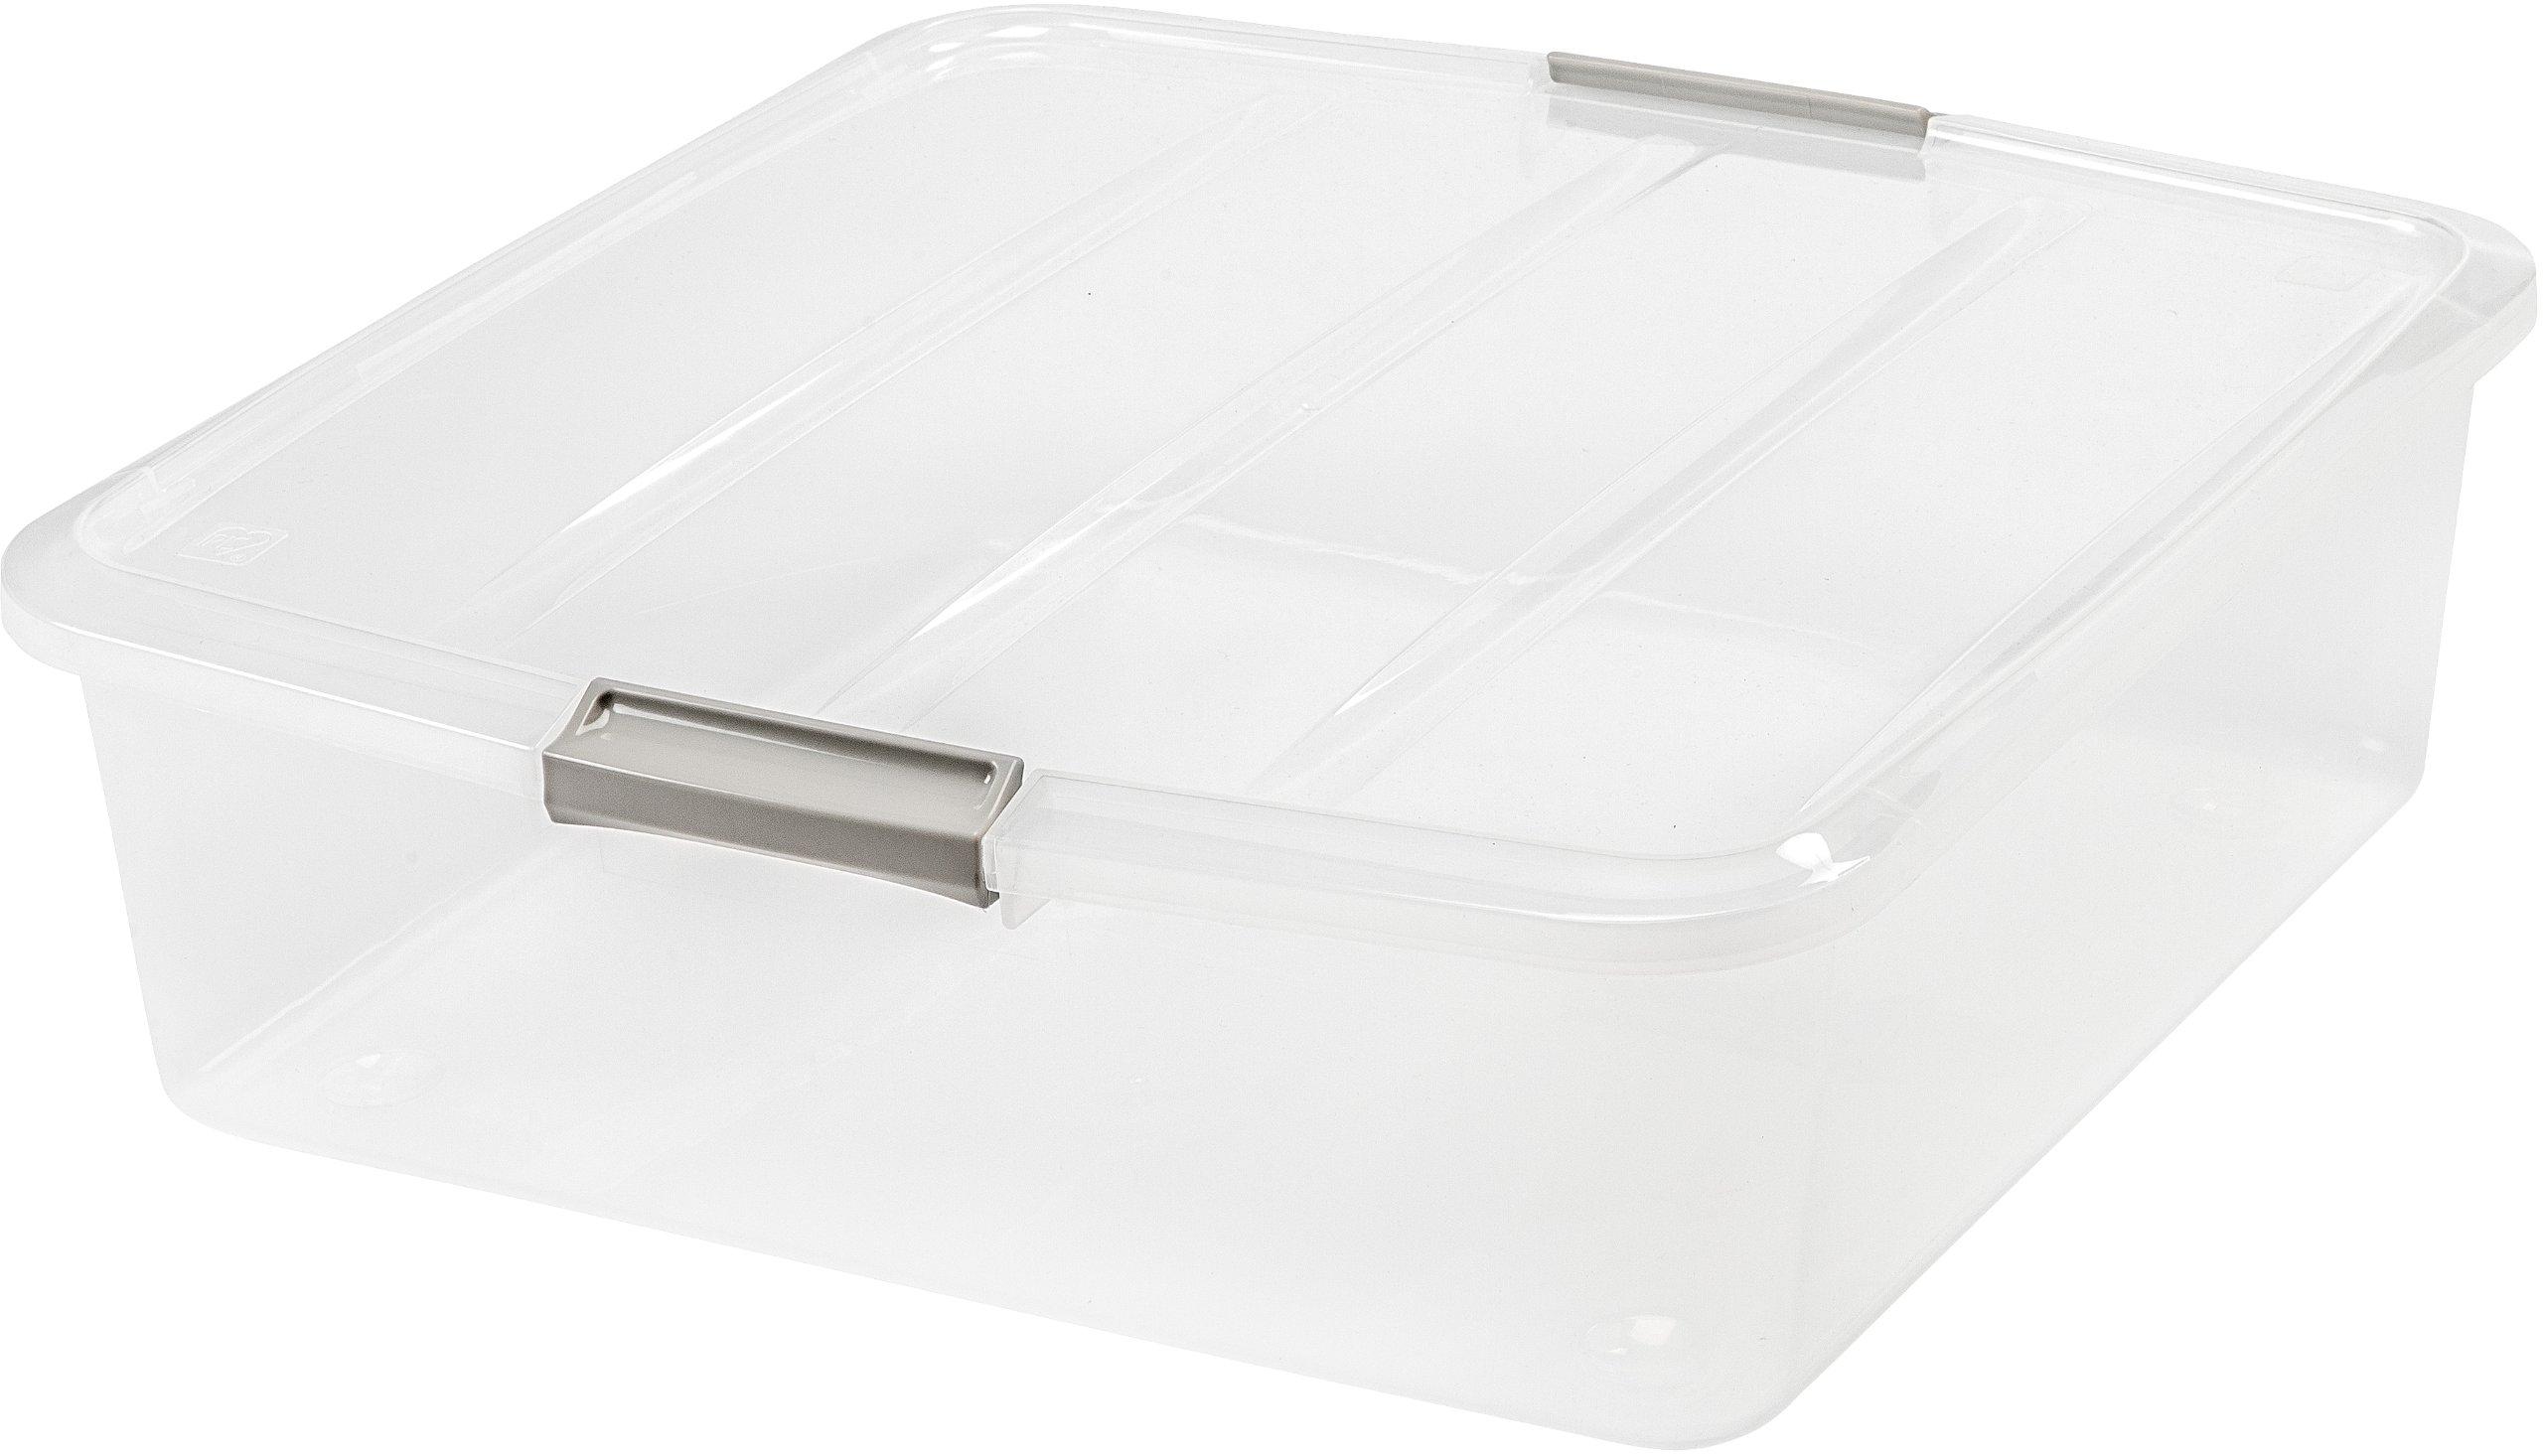 IRIS 33 Quart Buckle Up Box, 6 Pack by IRIS USA, Inc.